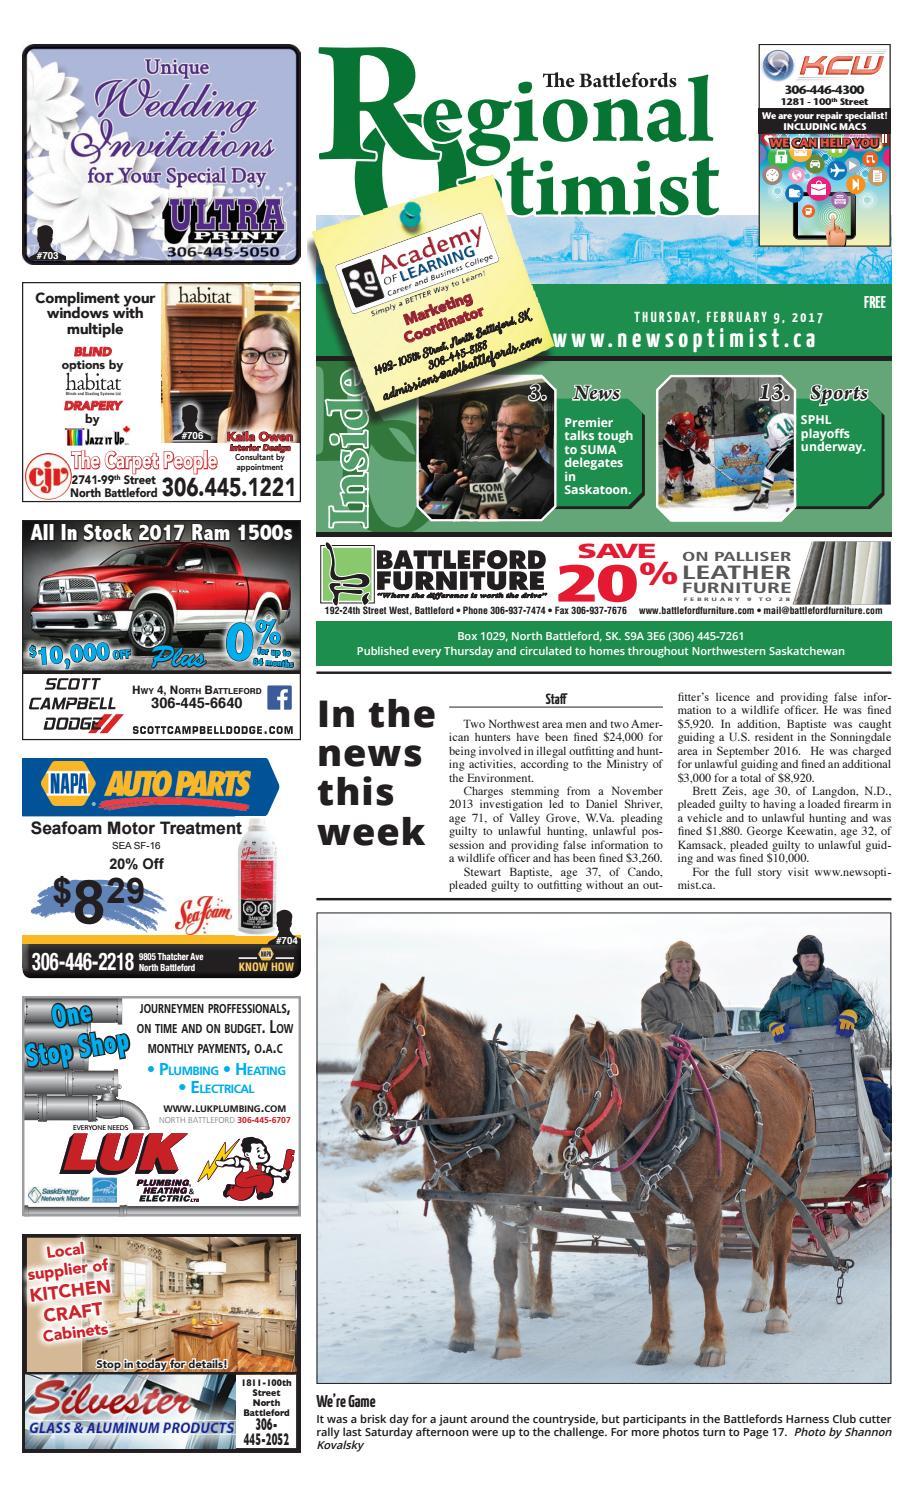 Regional Optimist February 9 by Battlefords News Optimist